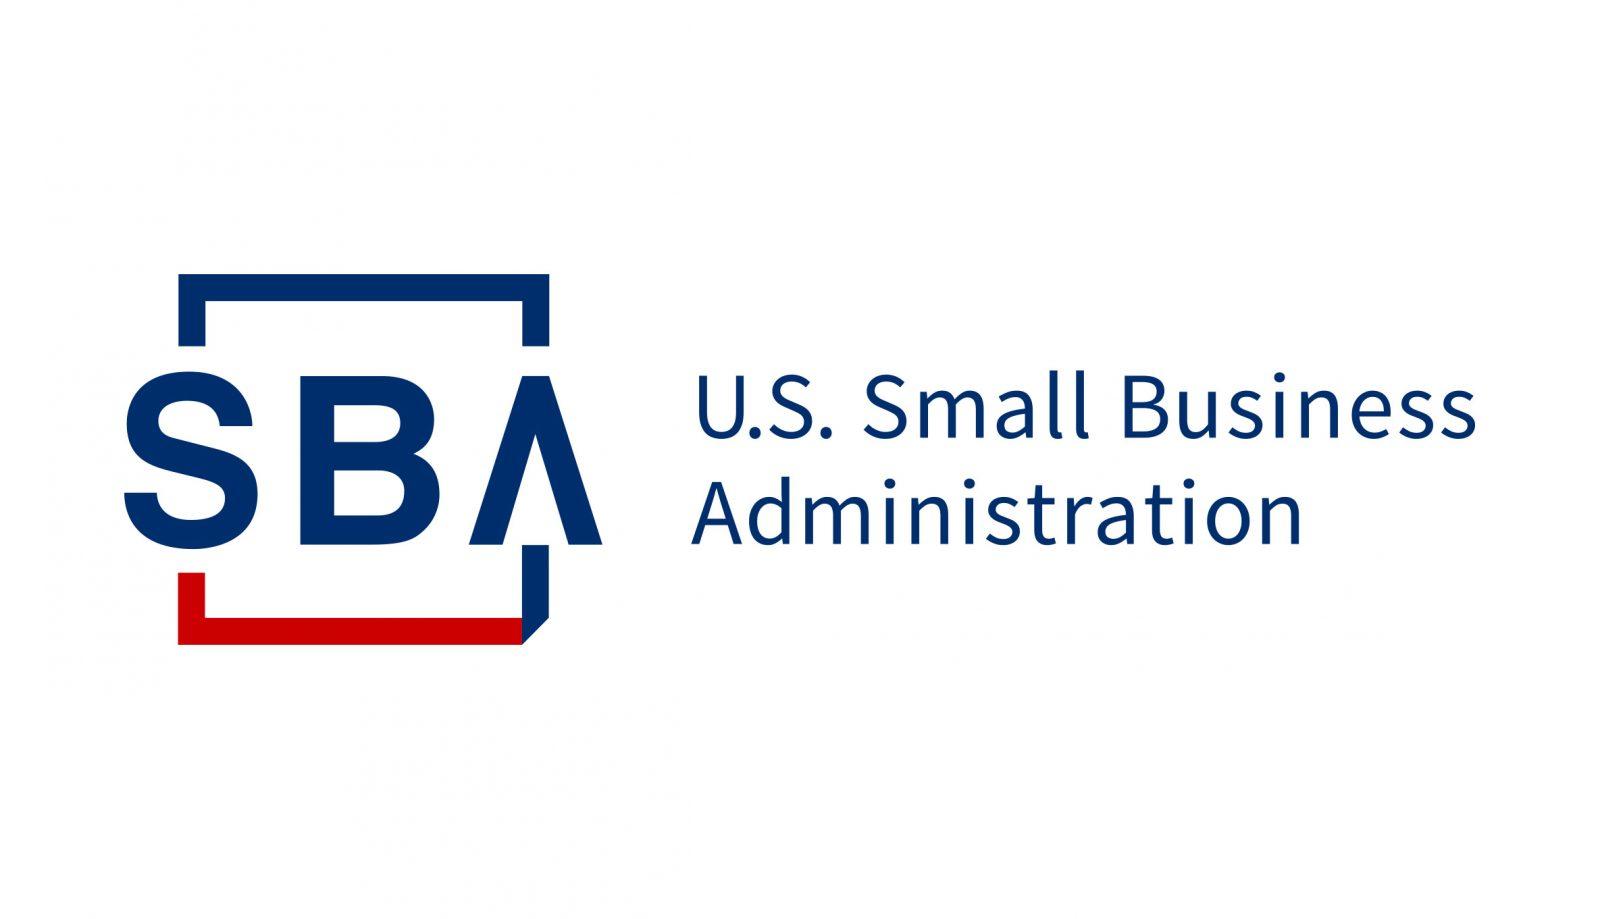 SBA blog image 2020